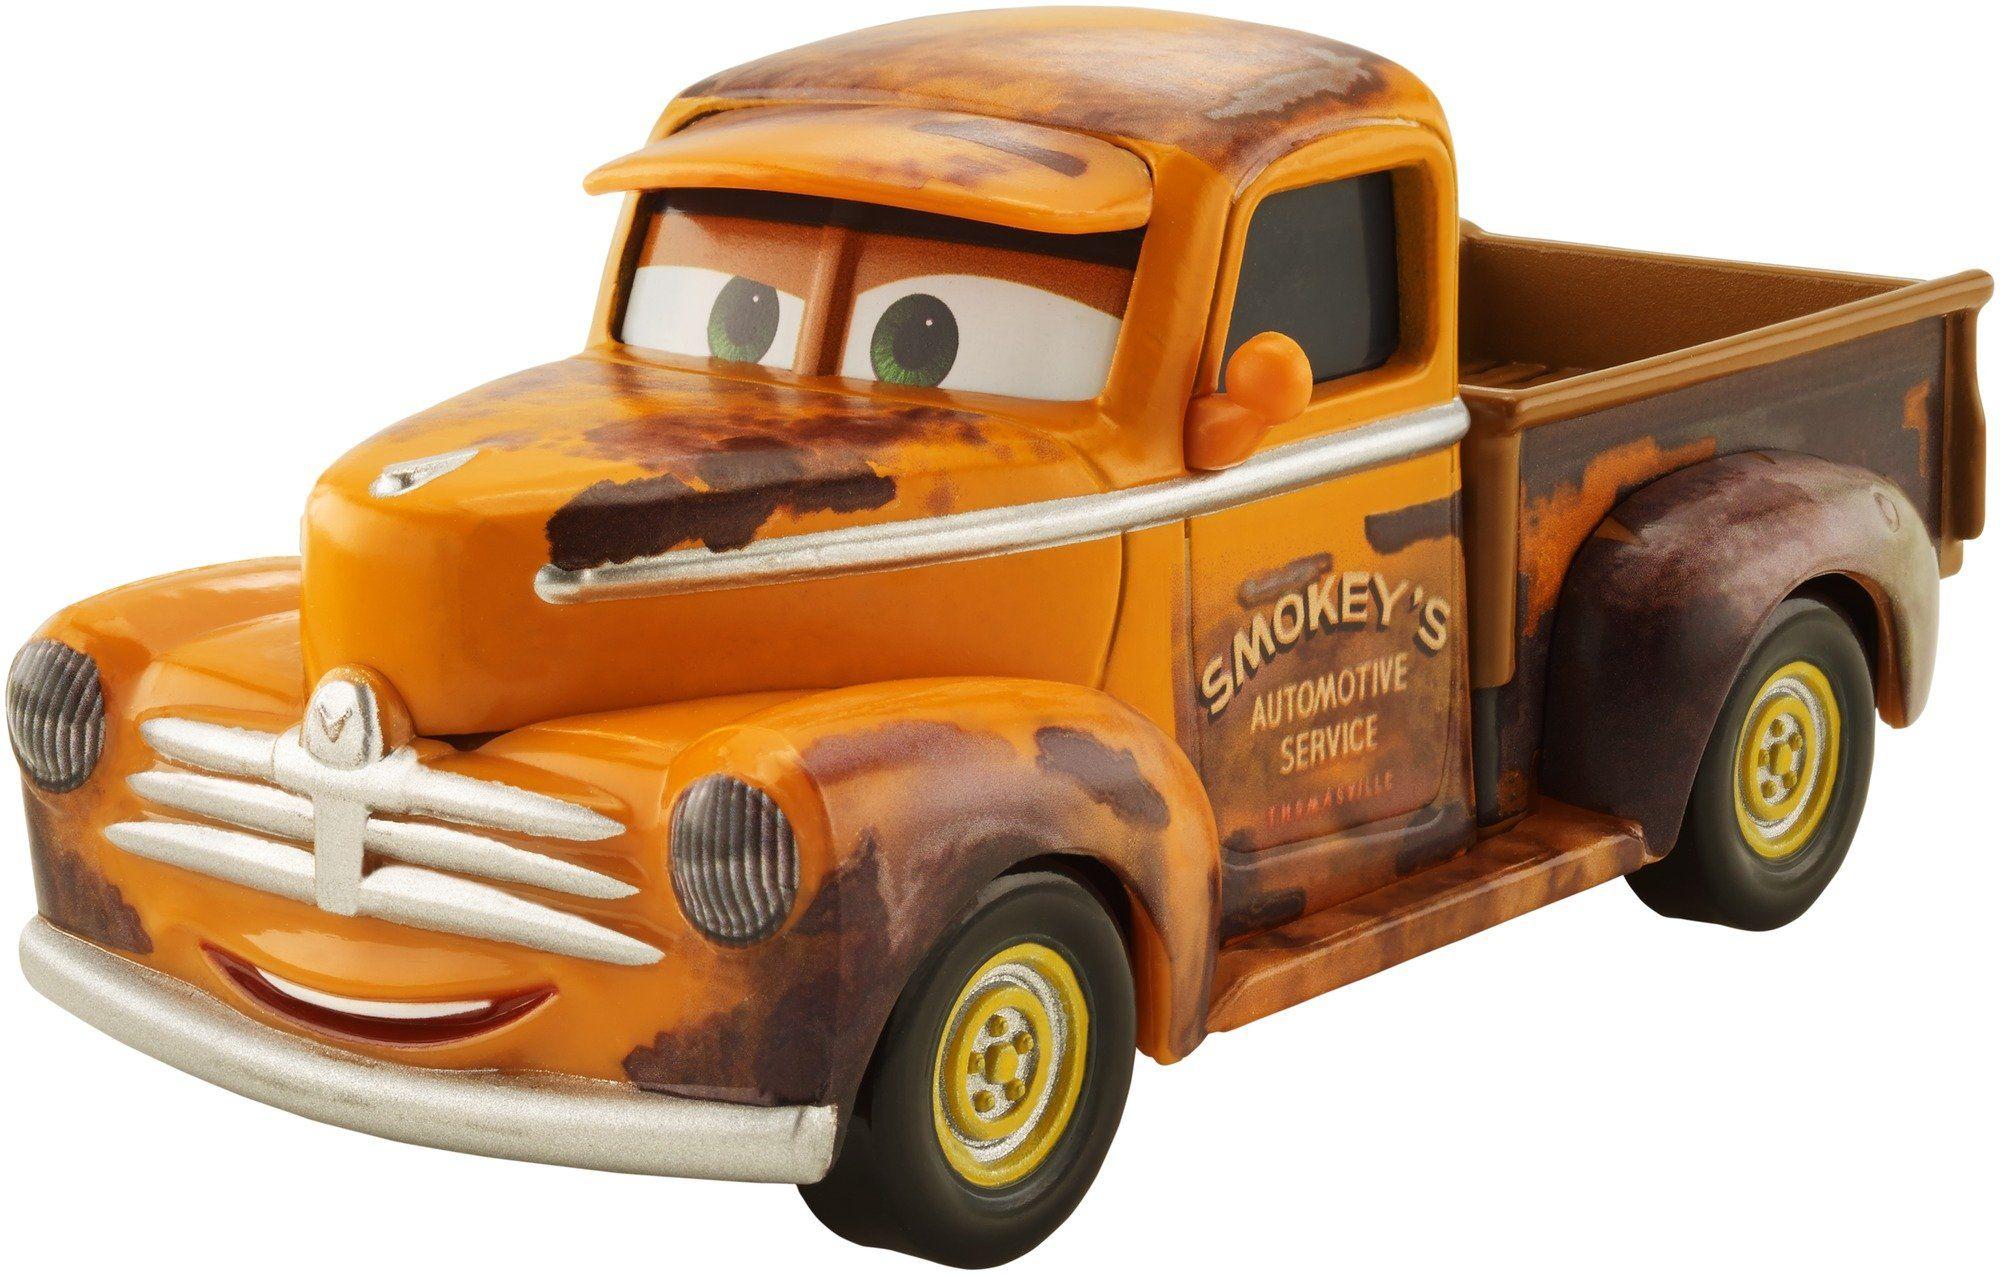 Disney Pixar Cars 3 Smokey DieCast Vehicle 155 Scale